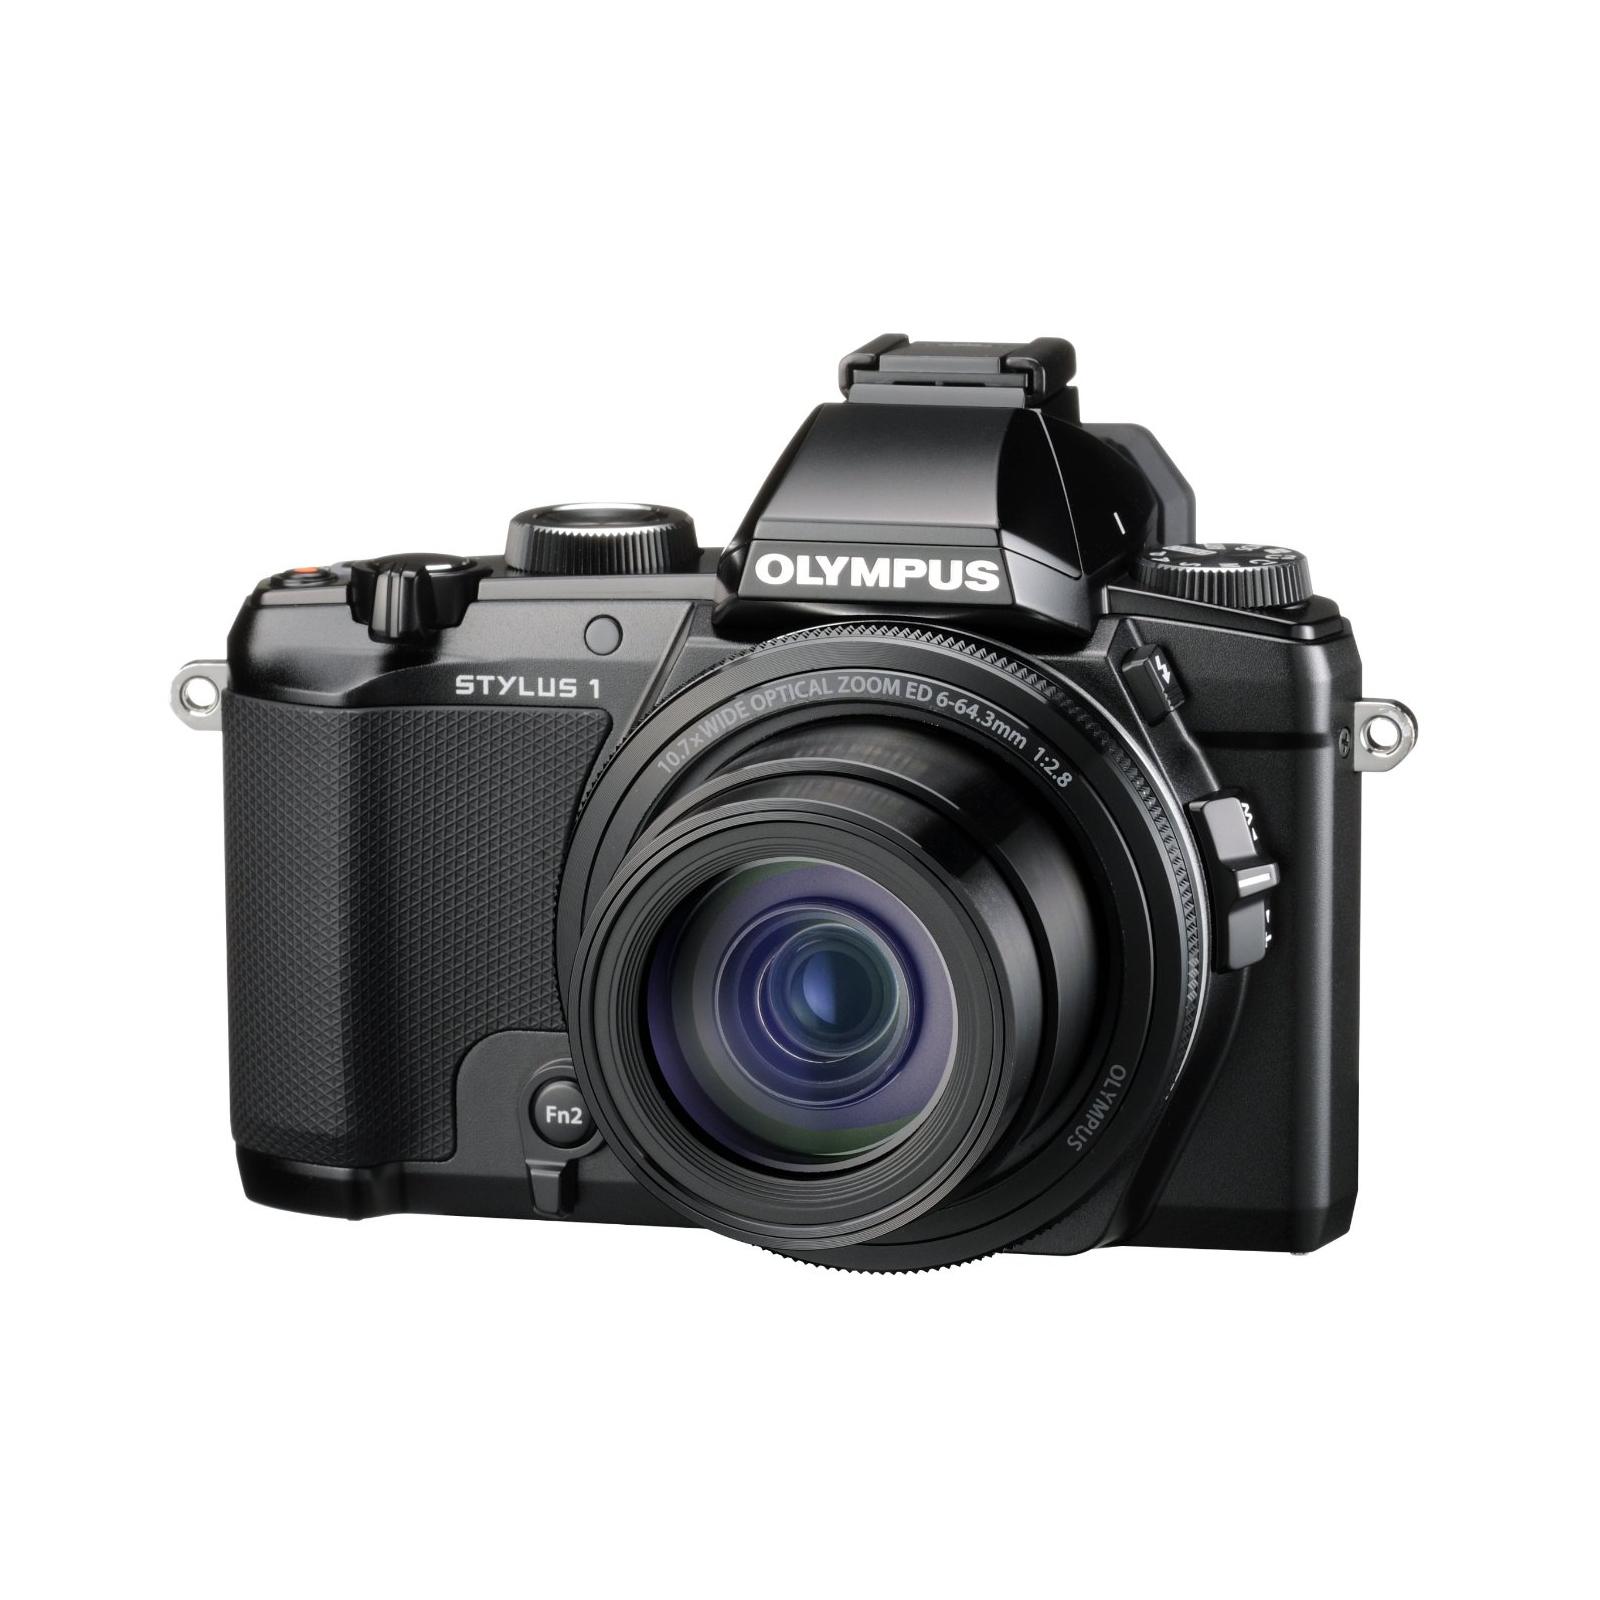 Цифровой фотоаппарат OLYMPUS STYLUS 1 Black (V109010BE000) изображение 7